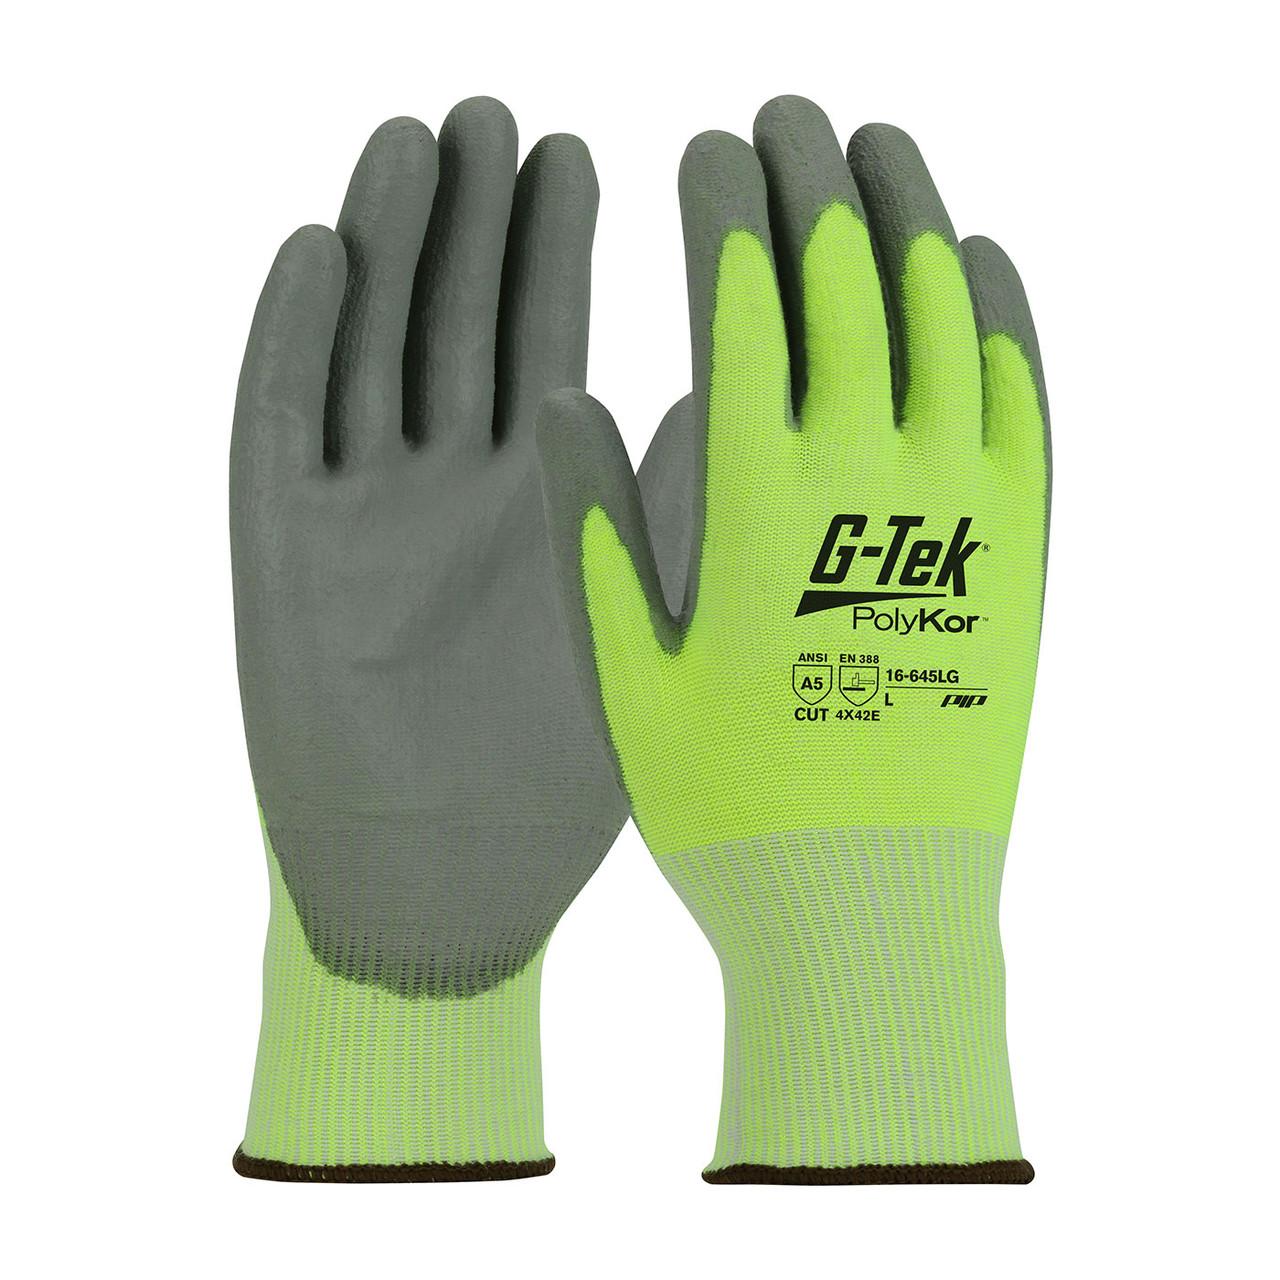 Hi-Vis Yellow M G-Tek PolyKor, HV Lime Green 13G Shell, Gray Polyurethane  Grip, A5 Gloves with PolyKor Fiber 1 Dozen 16-645LG/M